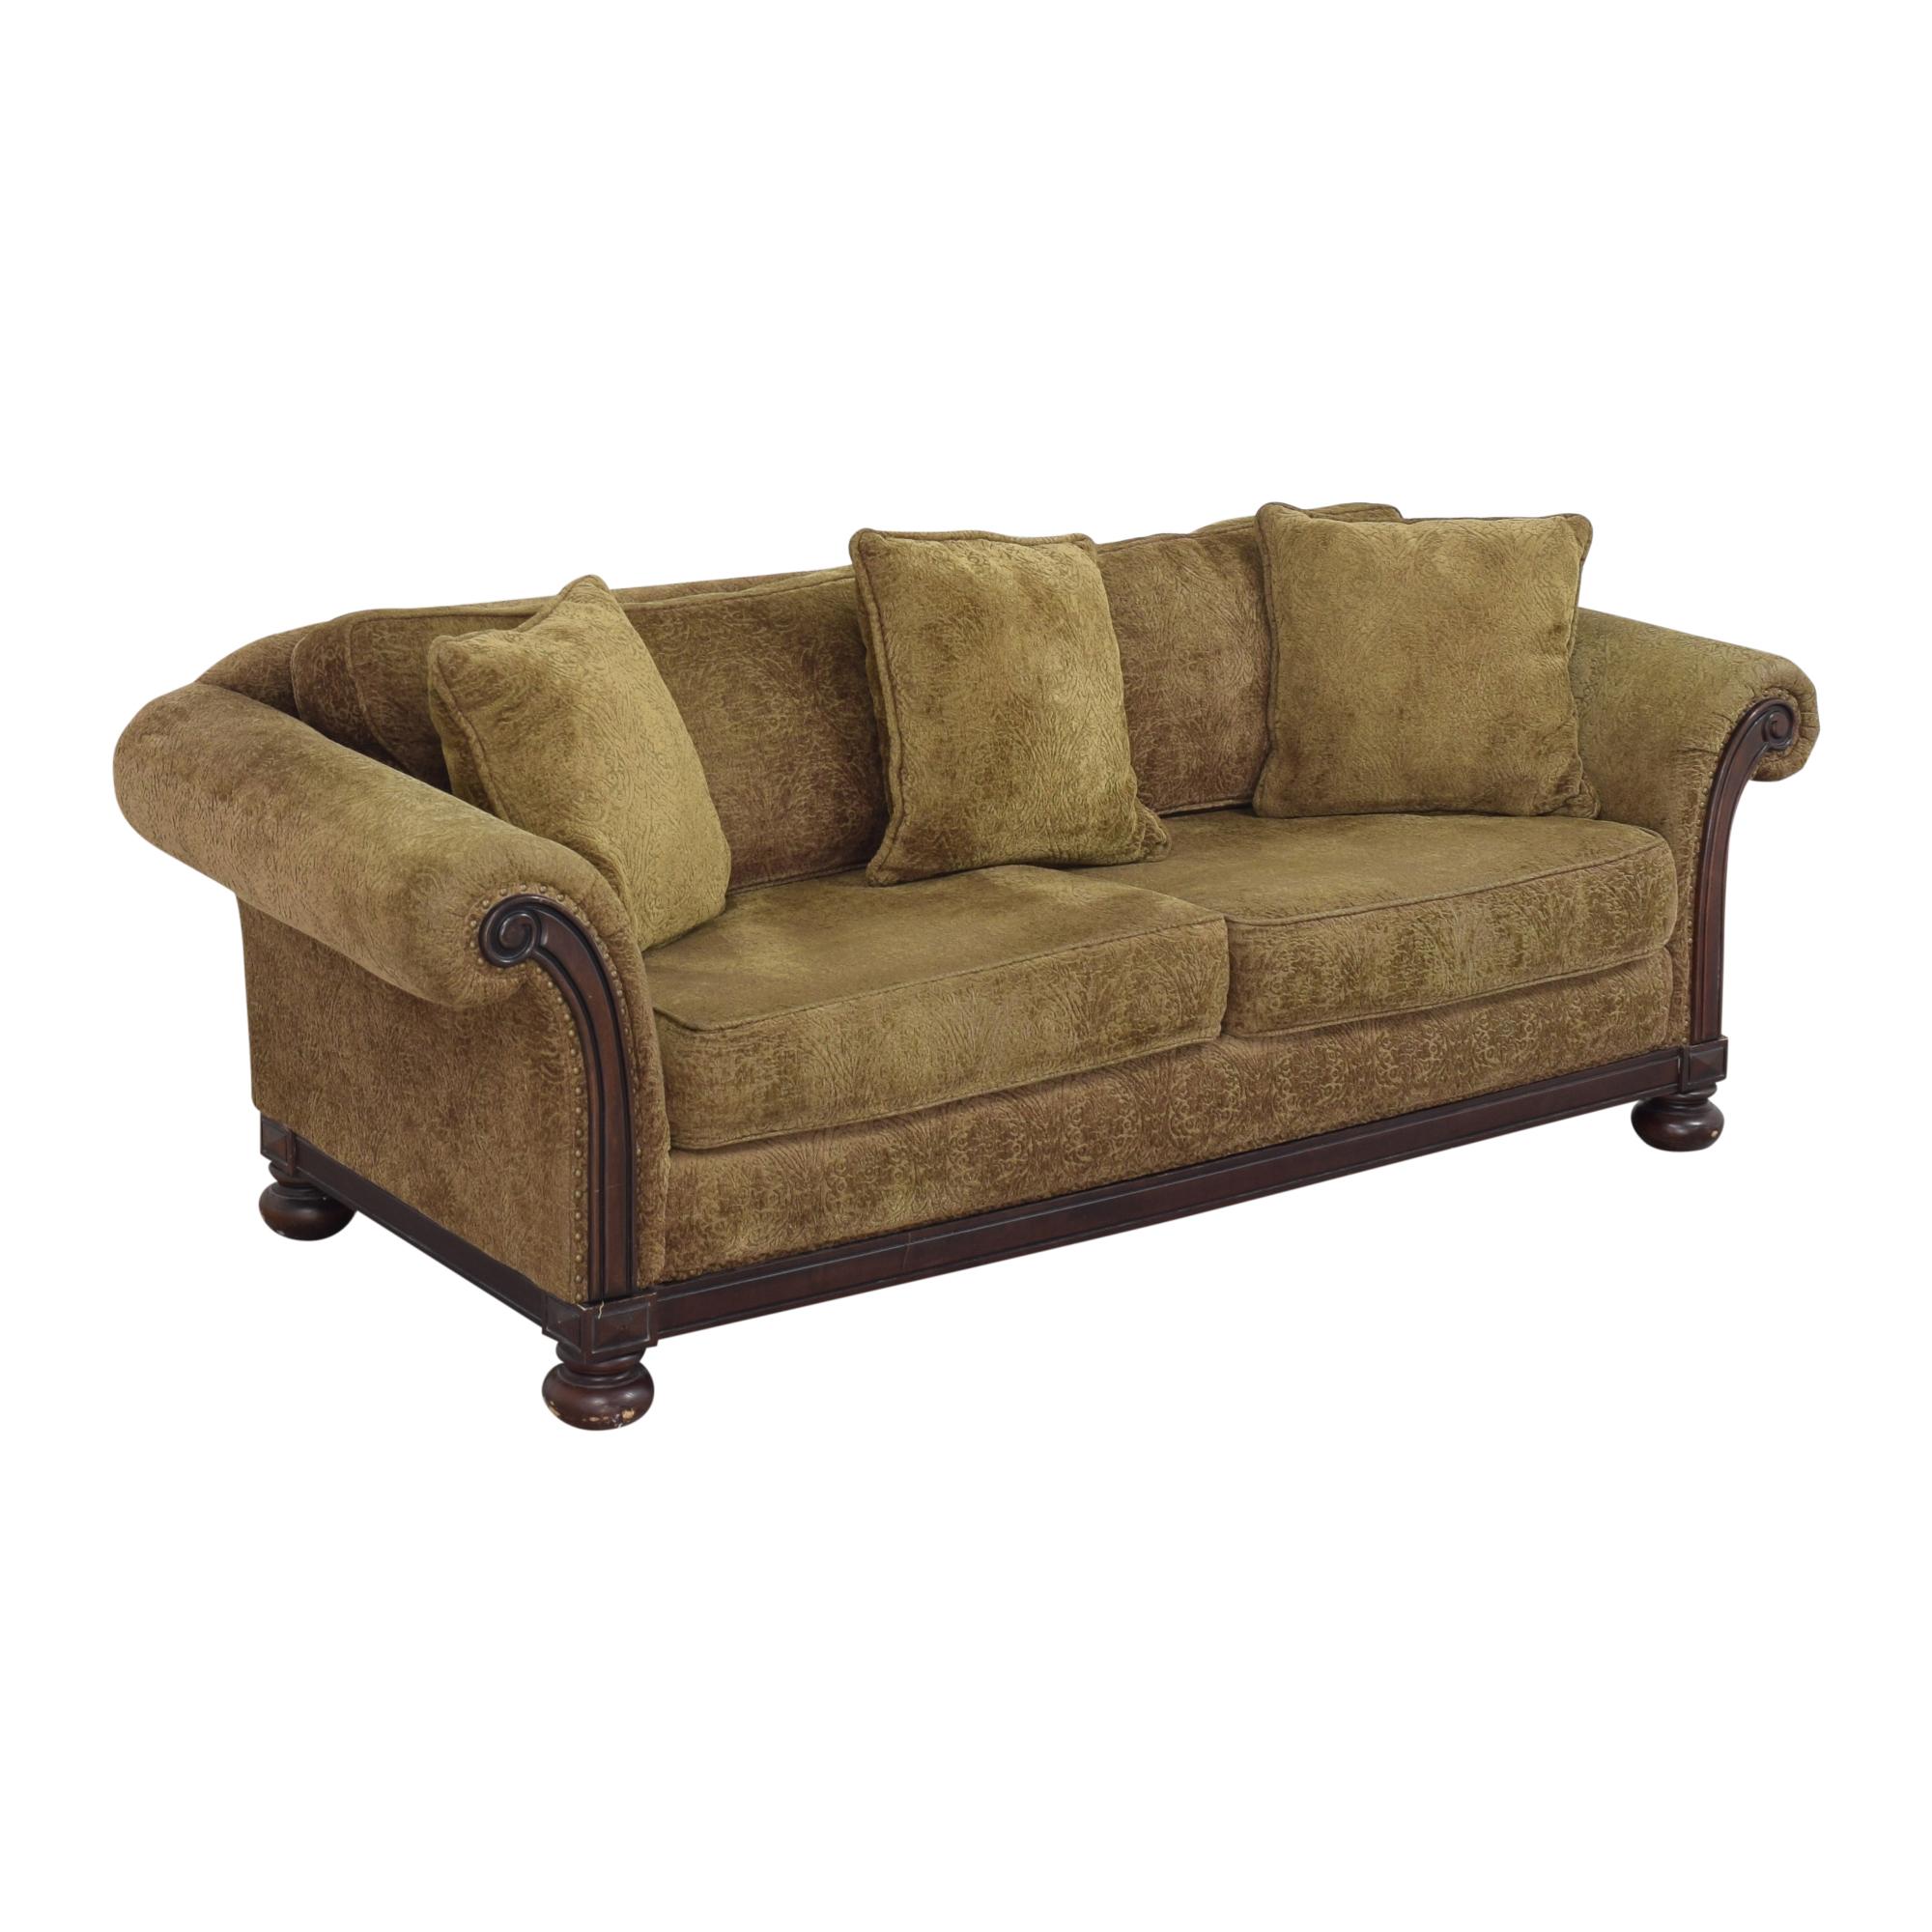 buy Bernhardt Two Cushion Roll Arm Sofa Bernhardt Sofas